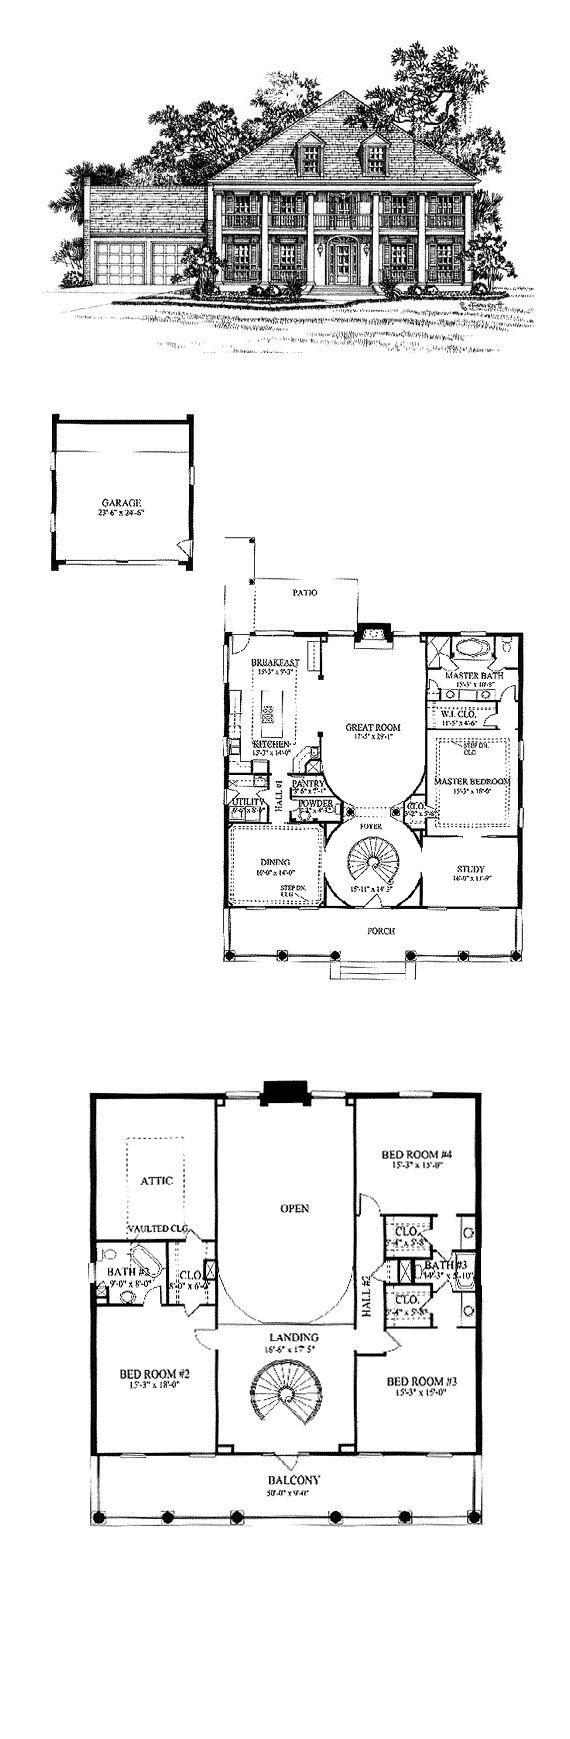 Best 25 Plantation Floor Plans Ideas On Pinterest House